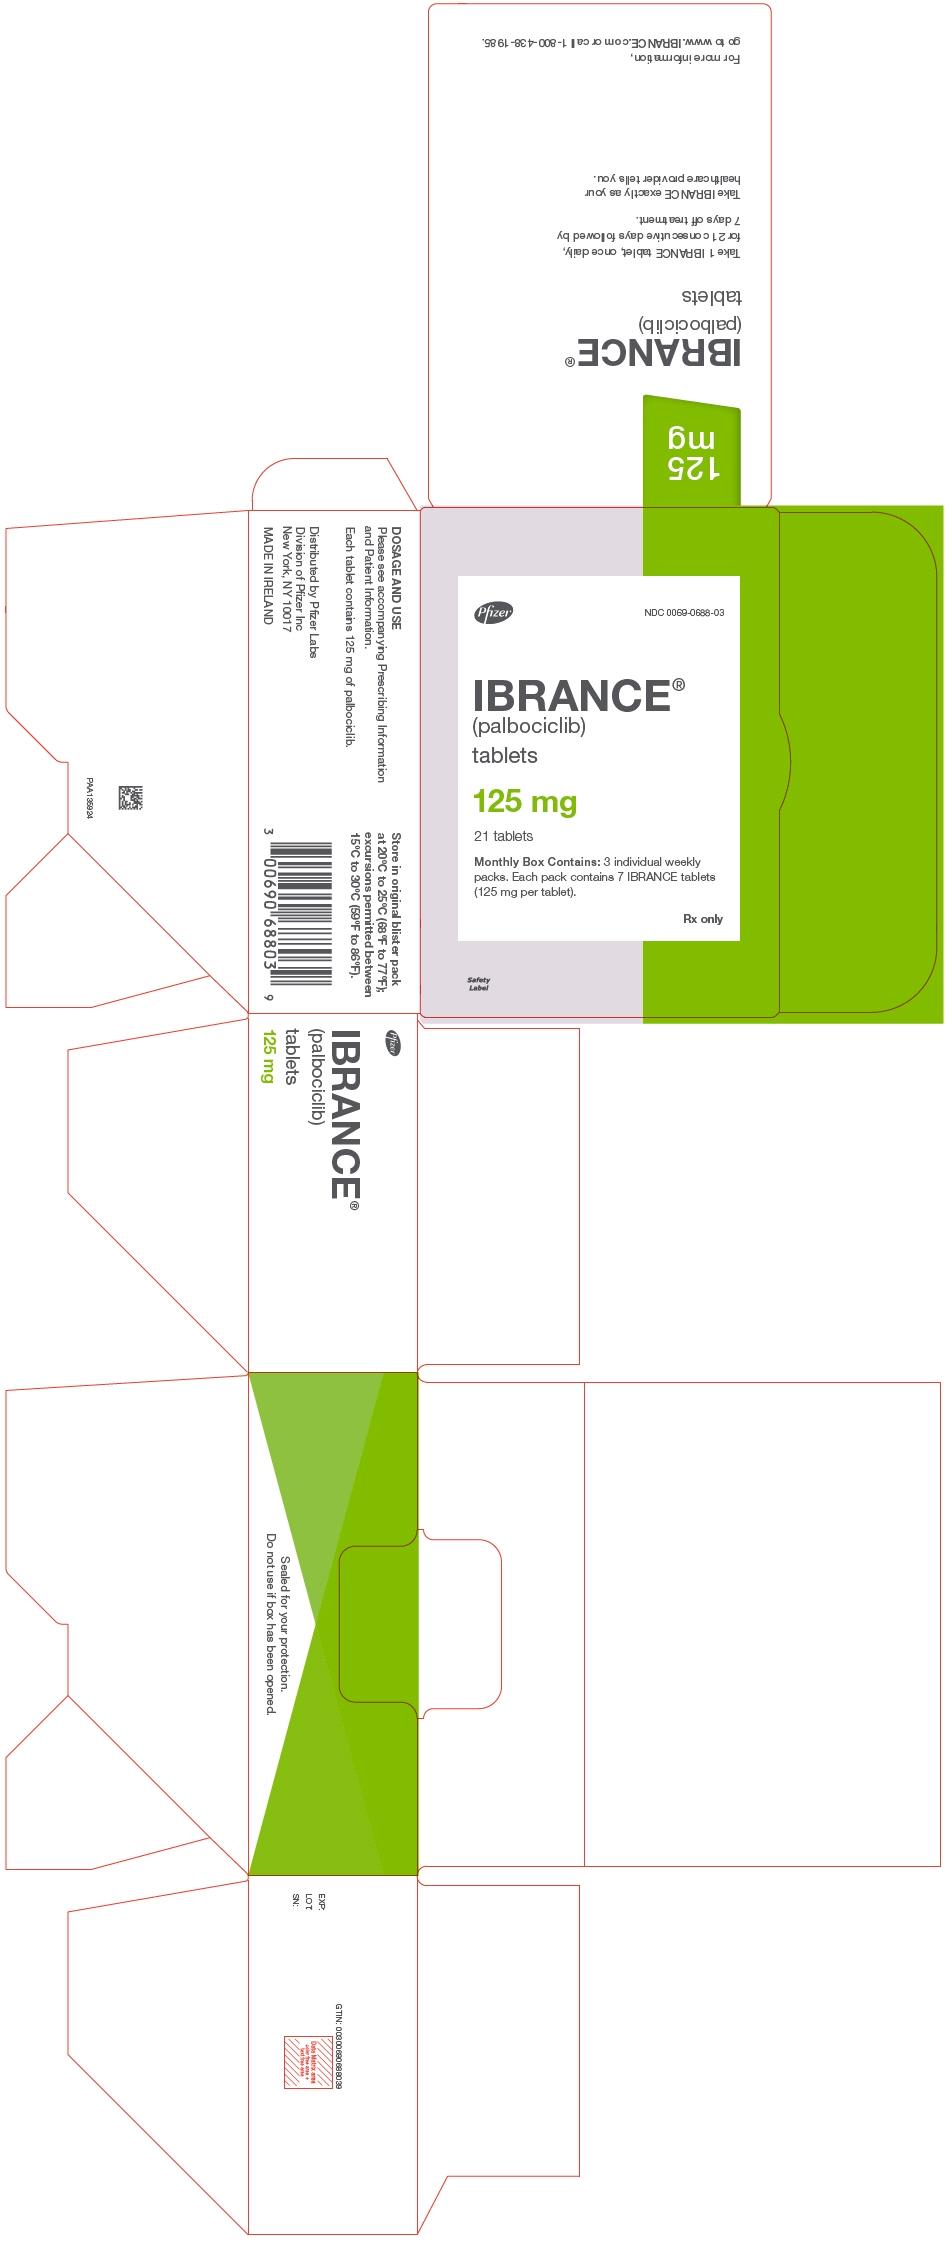 PRINCIPAL DISPLAY PANEL - 125 mg Tablet Dose Pack Carton